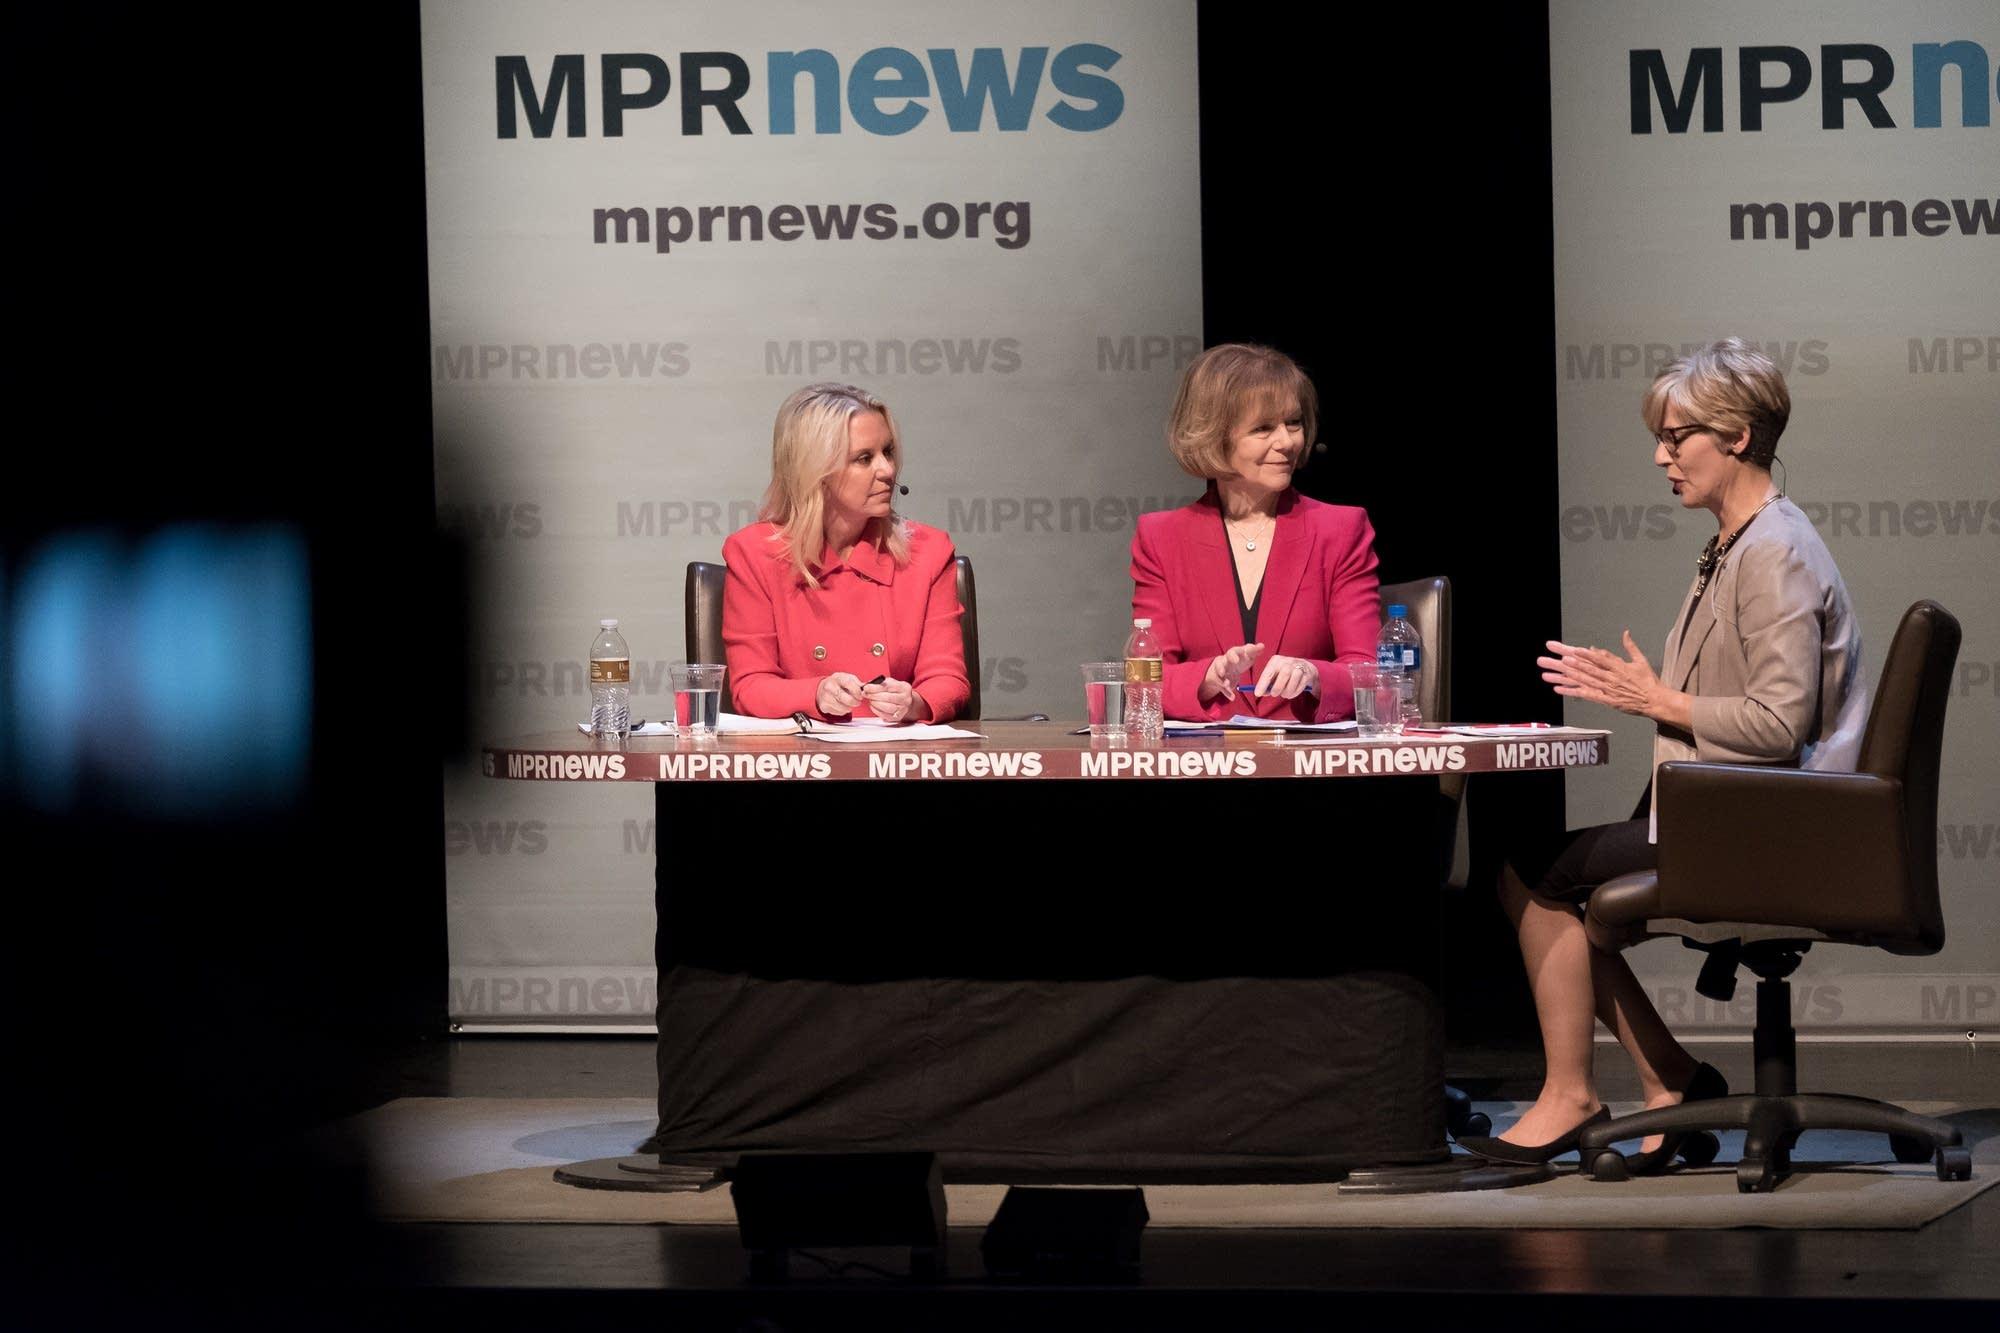 Tina Smith and Karin Housley hold final 2018 Minnesota U.S. Senate debate